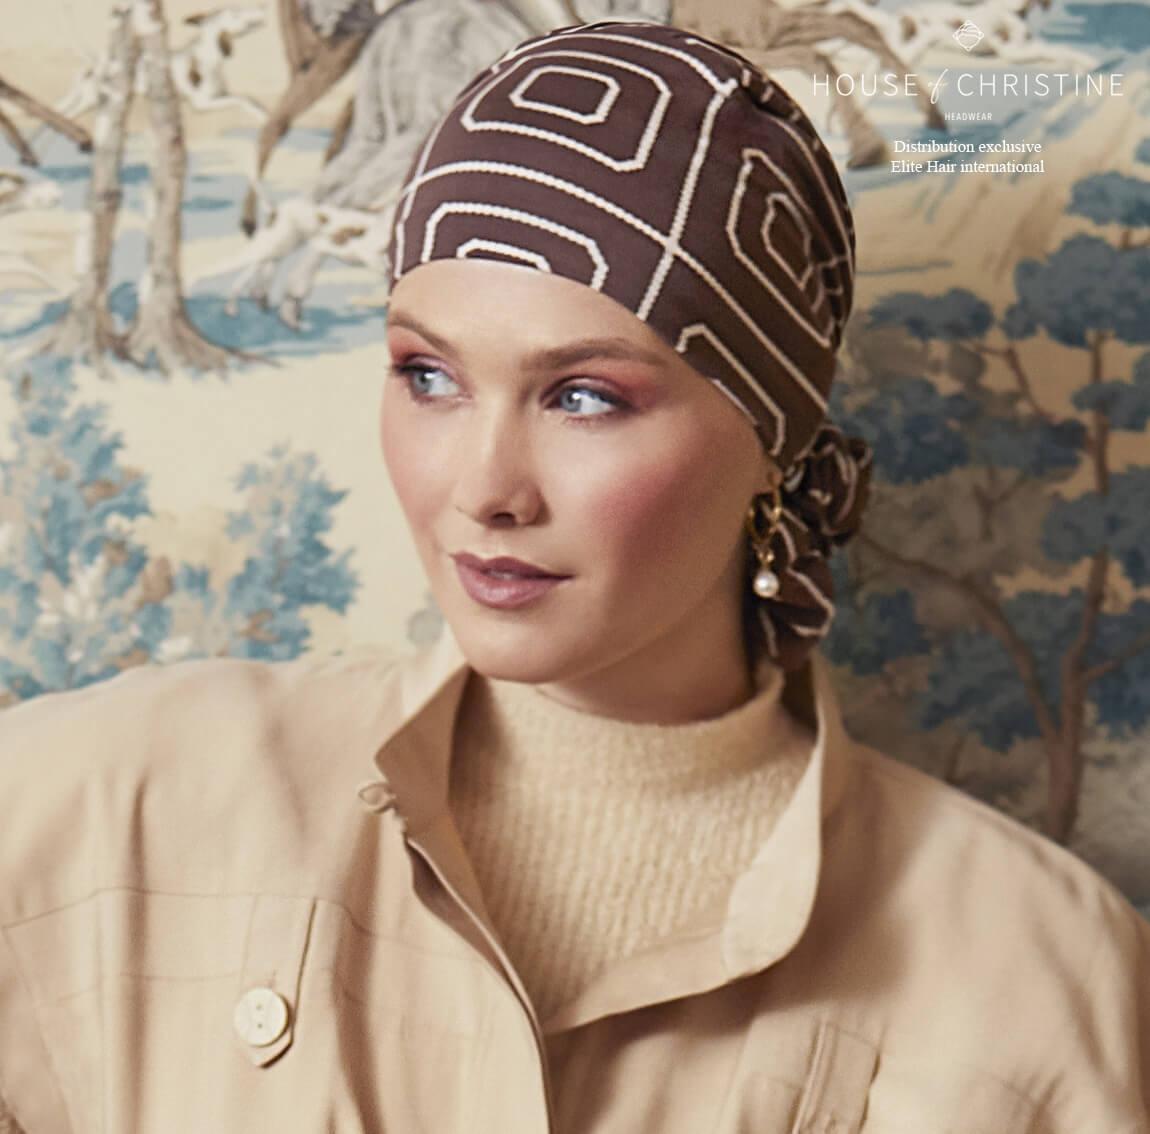 Bonnet chimio easy bambou, aventura, christine headwear